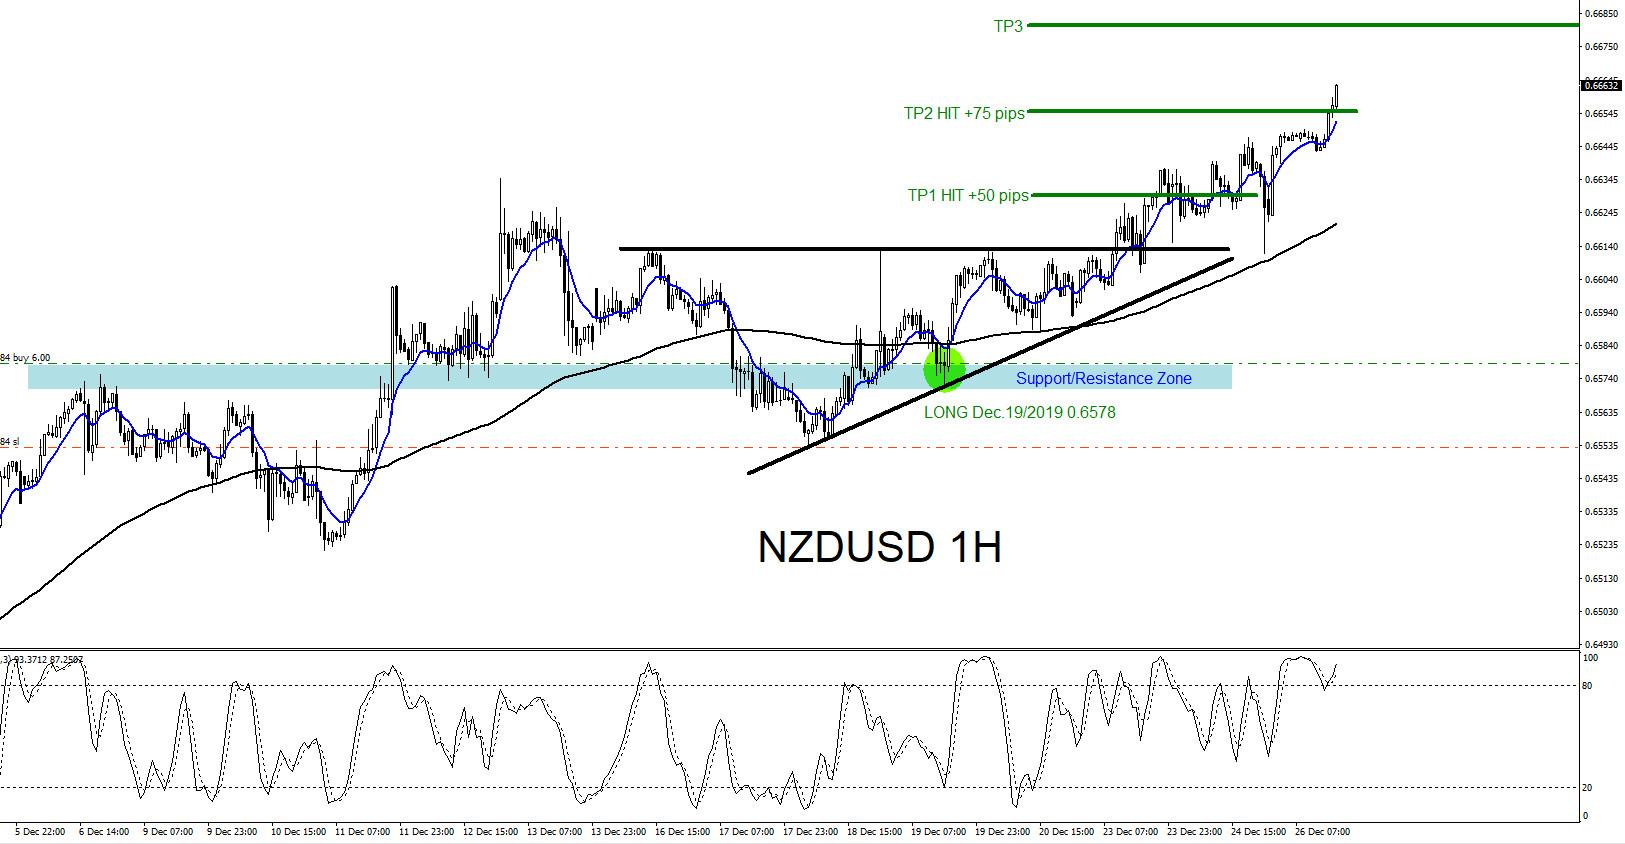 NZDUSD : Trading the Move Higher